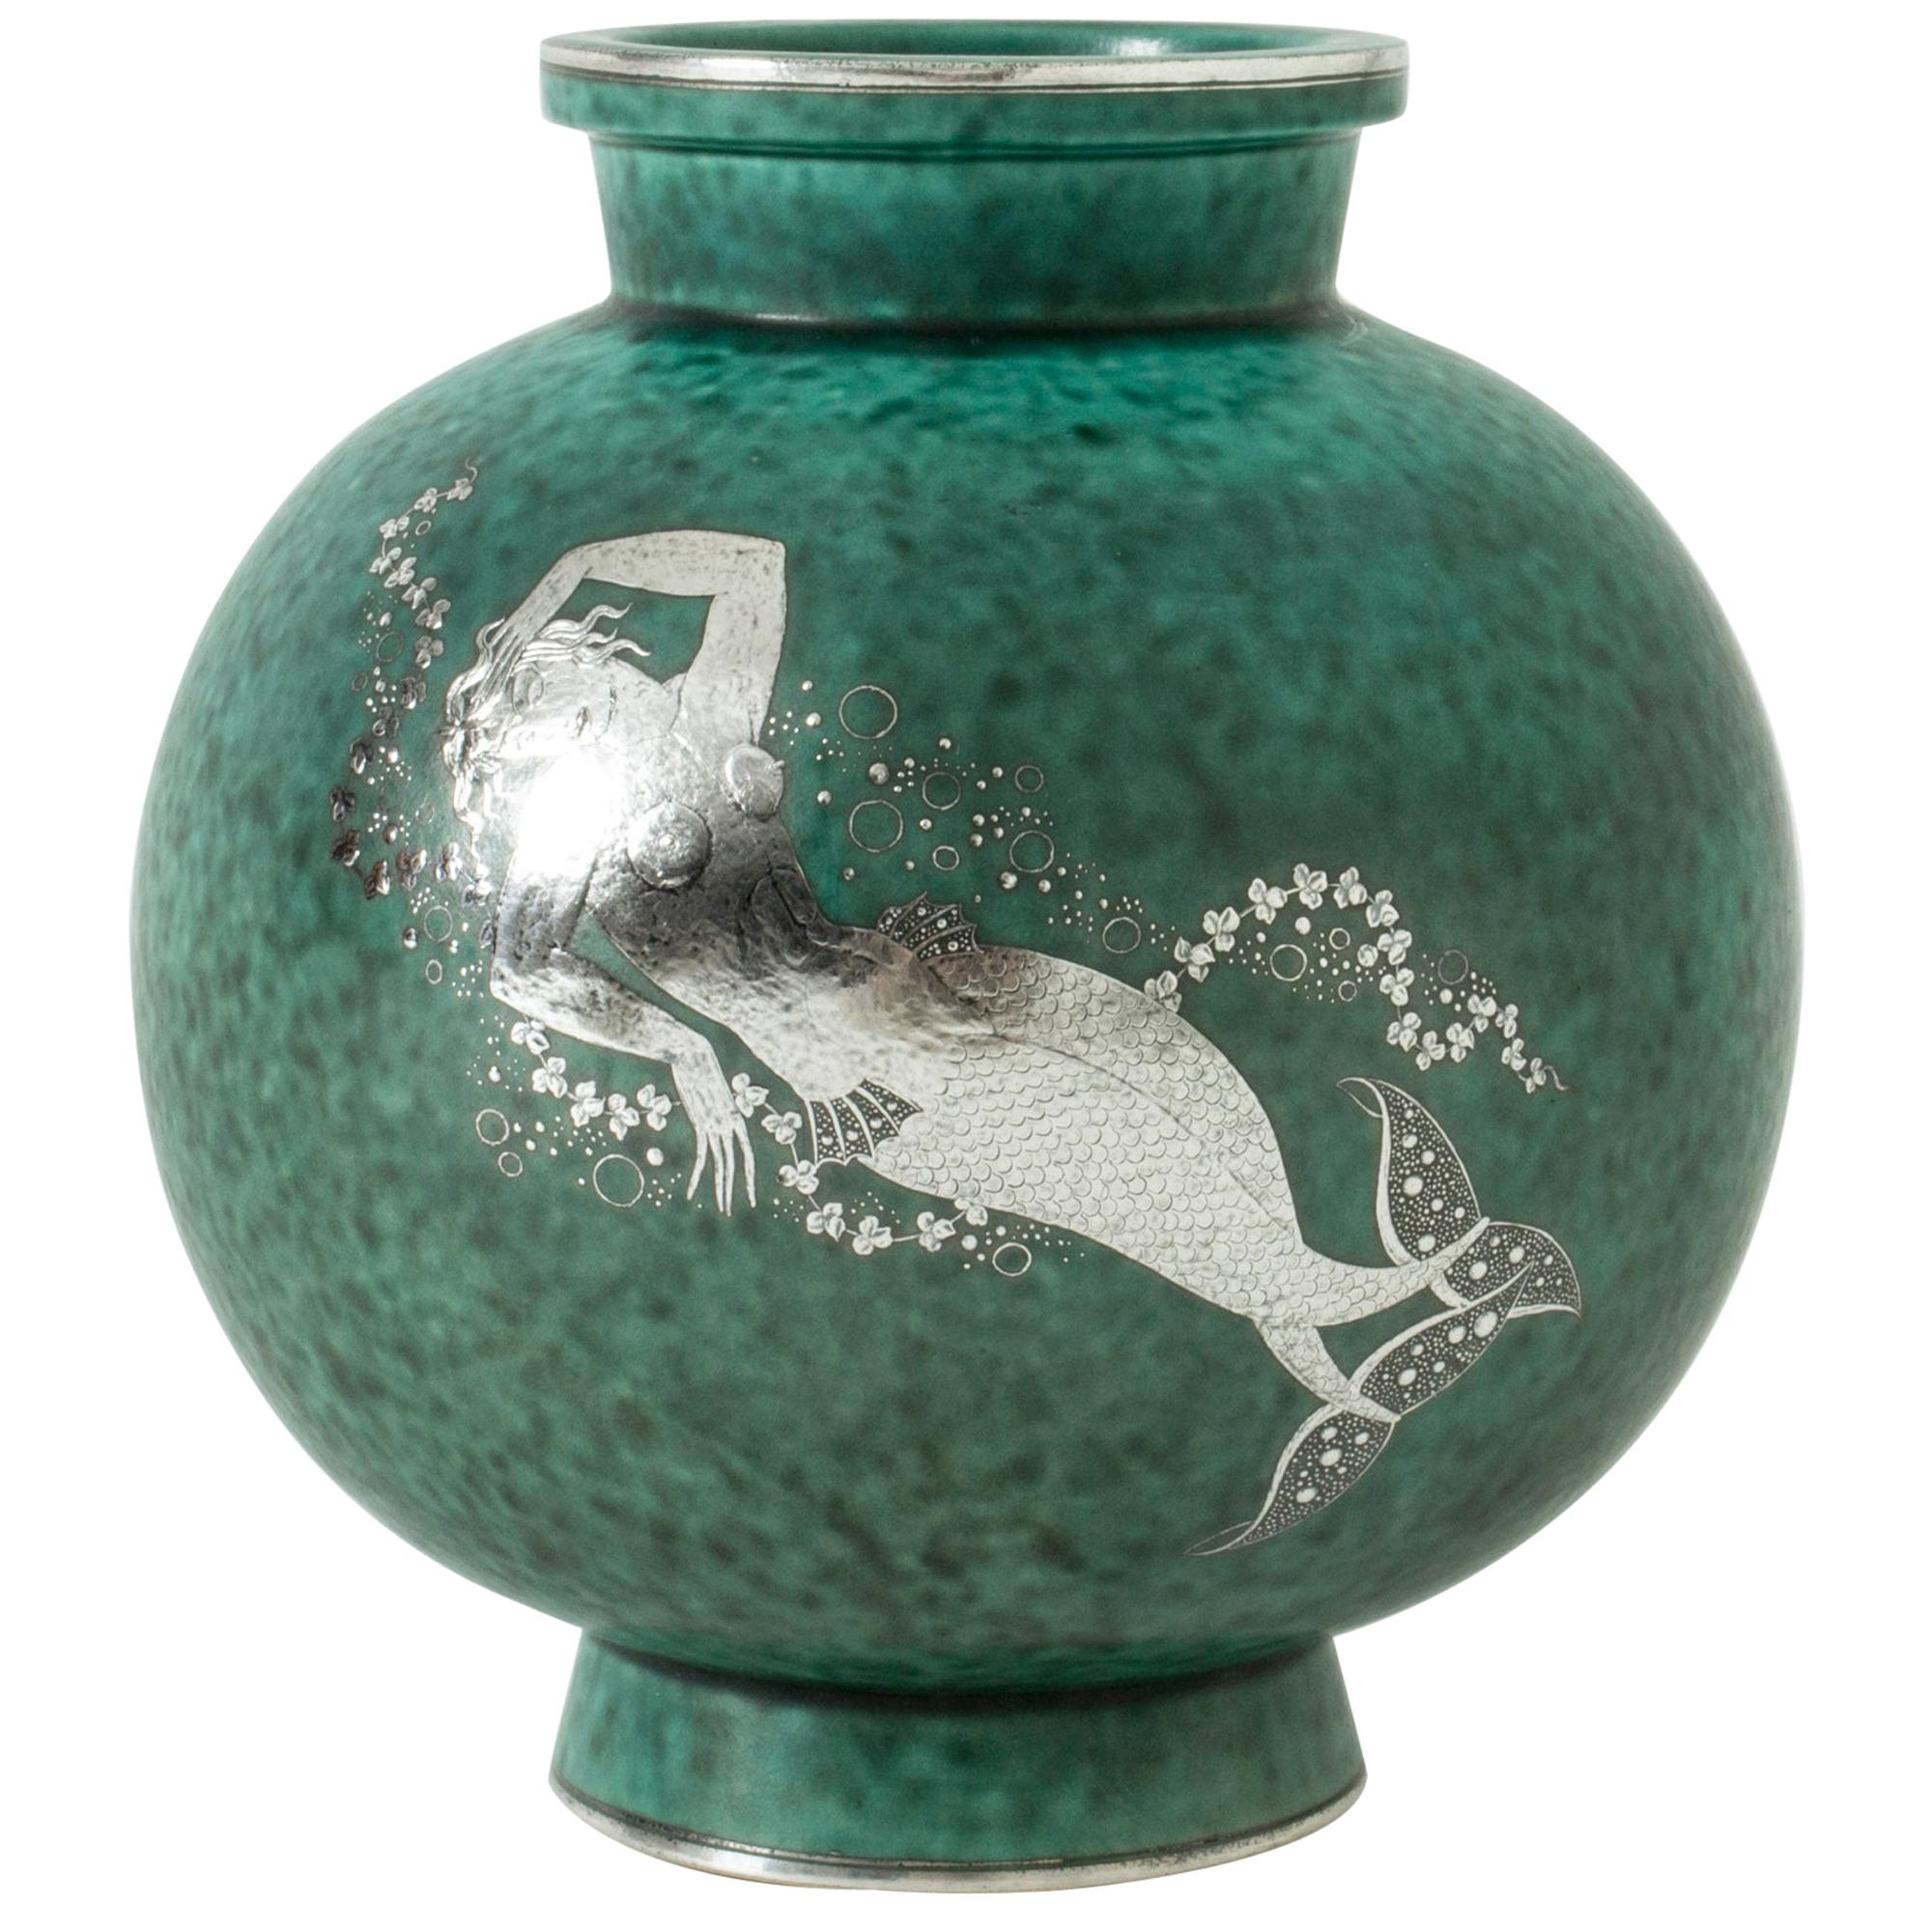 "Stoneware ""Argenta"" Vase by Wilhelm Kåge for Gustavsberg, Sweden, 1940s"